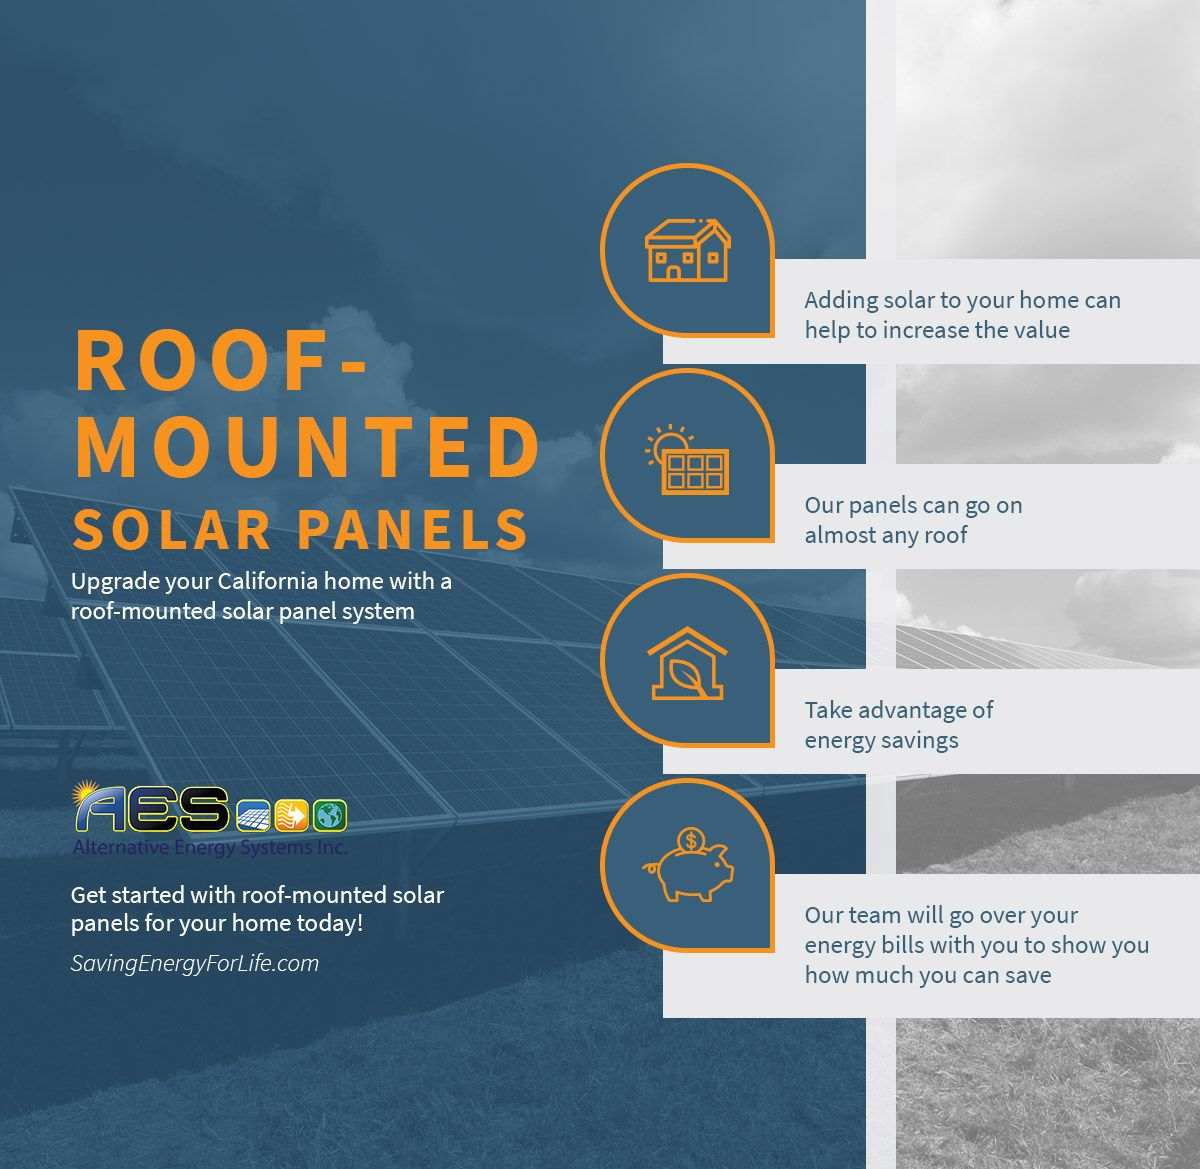 Roof-Mounted Solar Panels.jpg